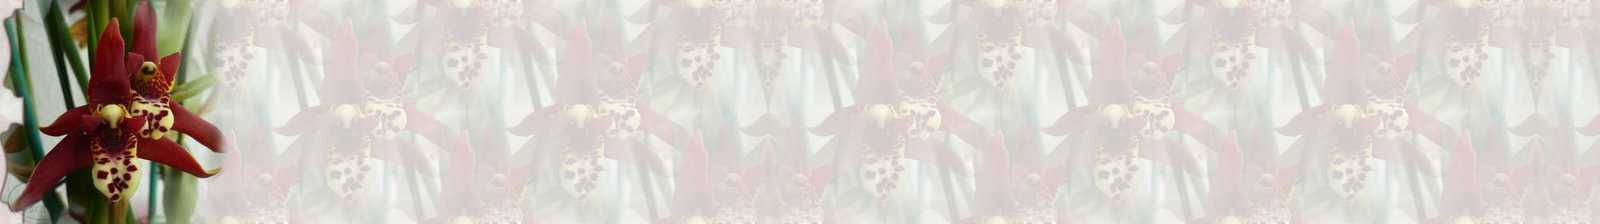 Maxillaria tenuifolia Incredimail &amp&#x3B; Papier A4 h l &amp&#x3B; outlook &amp&#x3B; enveloppe &amp&#x3B; 2 cartes A5 &amp&#x3B; signets 3 langues   orch_maxillaria_tenuifolia_130510_96_00